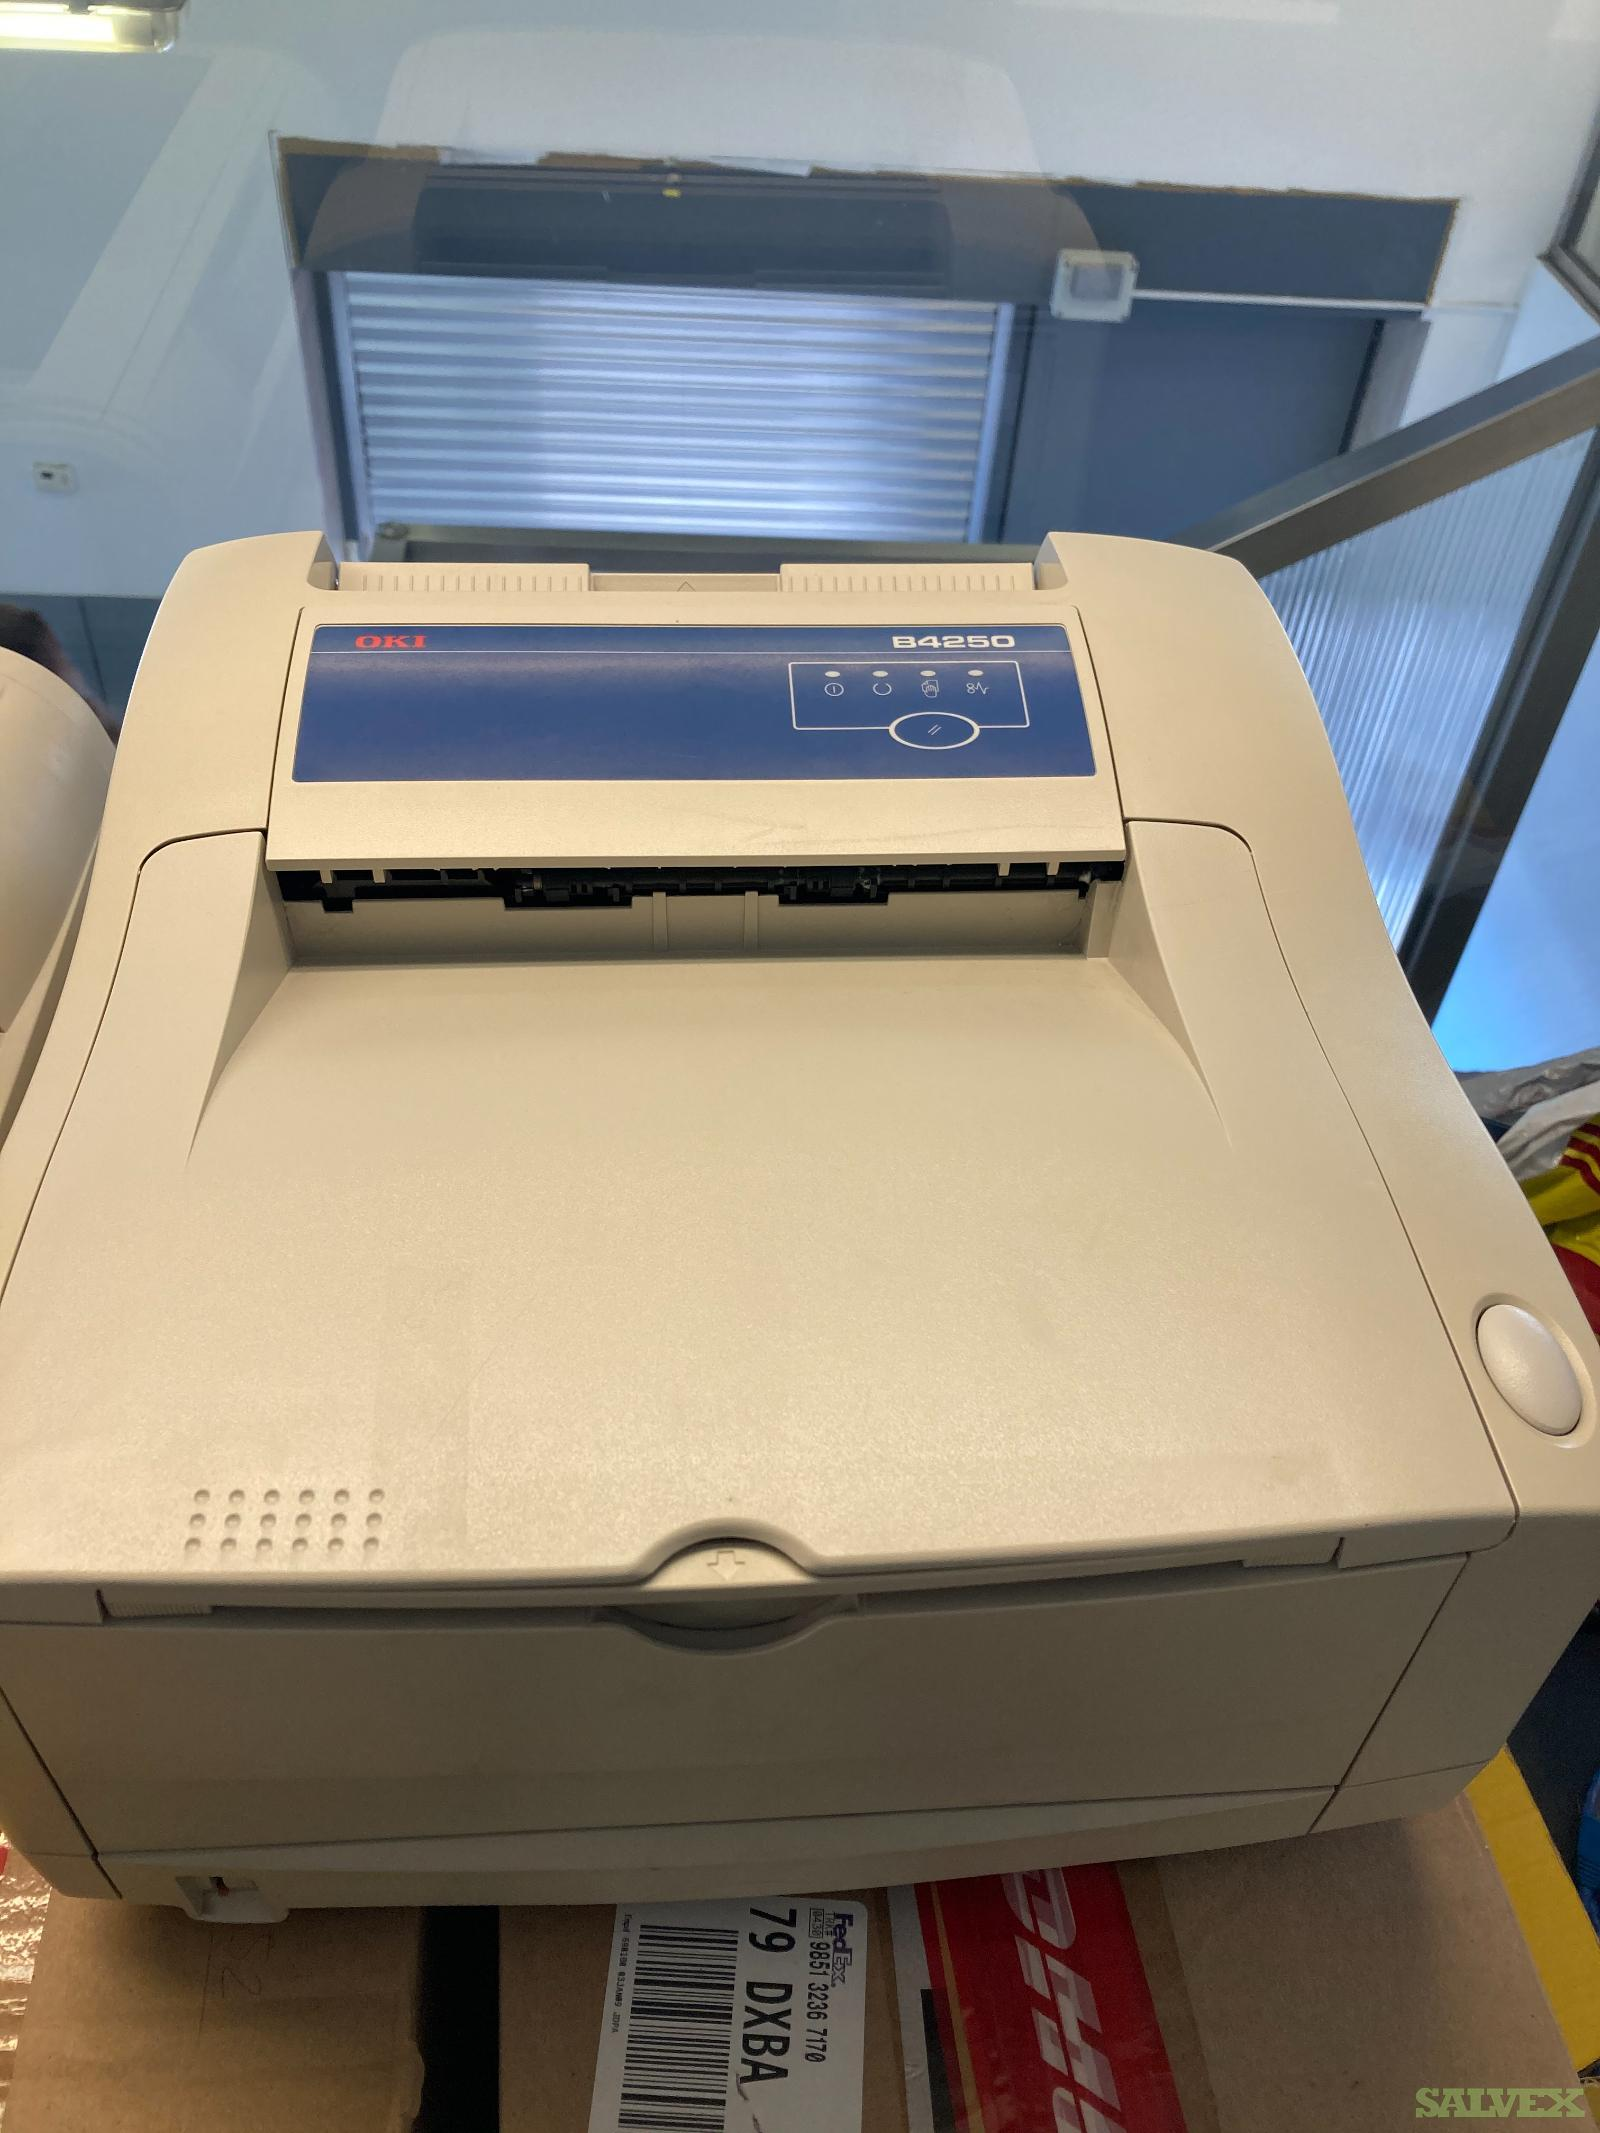 OKI Printer B4250, Microline 5591, Canon DR3060 and PSION 4 Slots Cradles